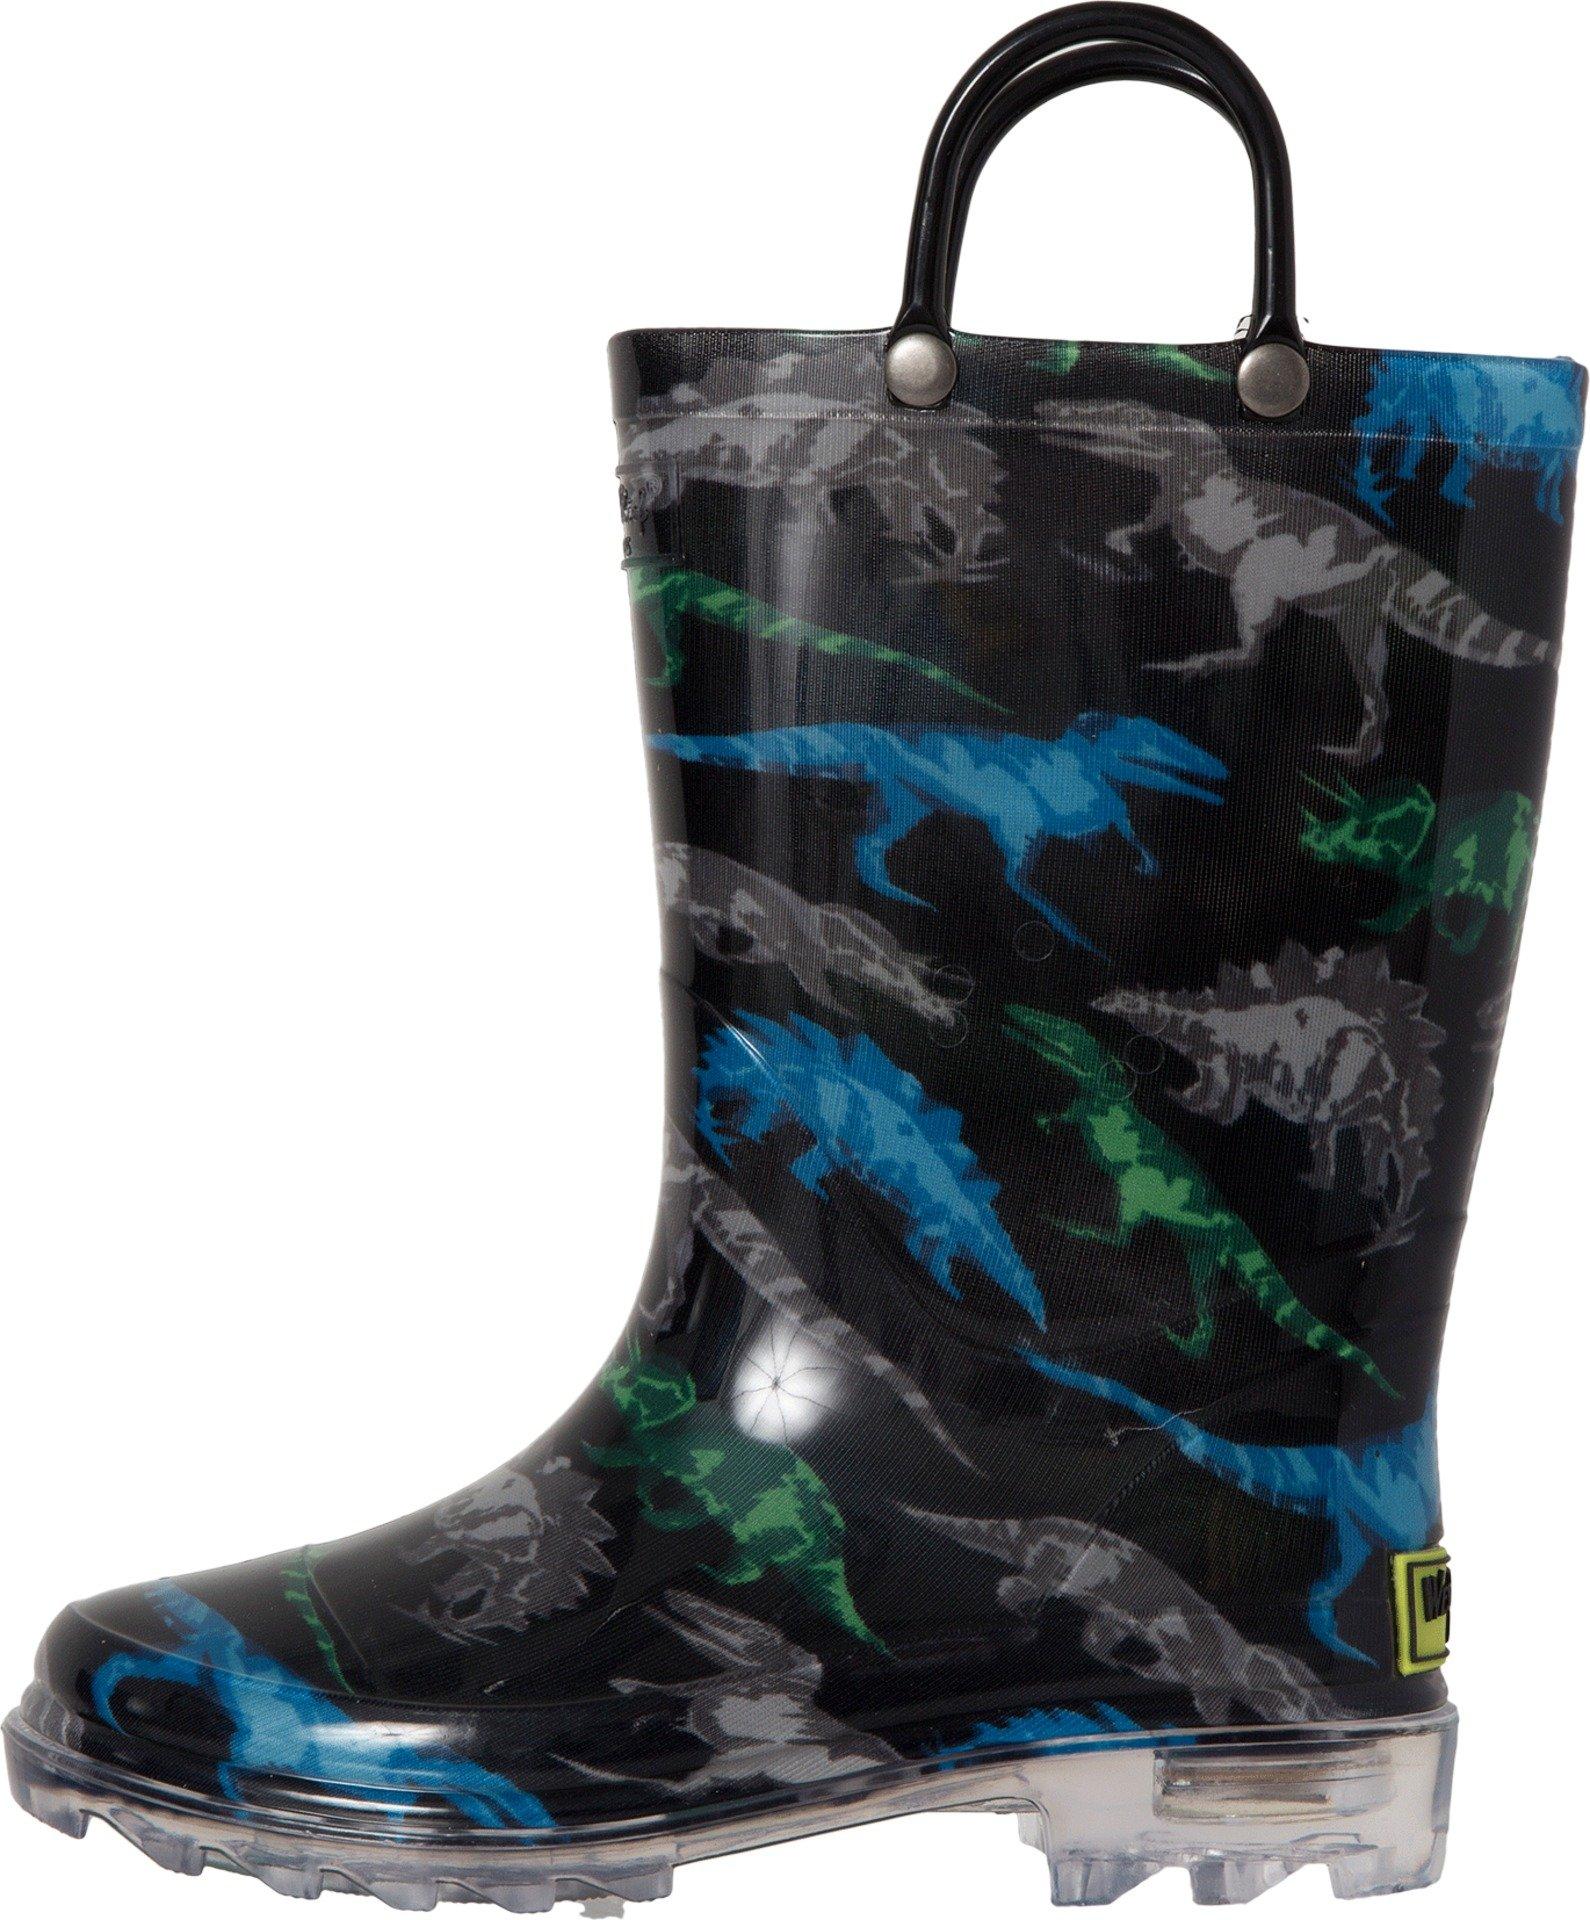 Western Chief Boys' Light-up Waterproof Rain Boot, Dinosaur Friends, 1 M US Little Kid by Western Chief (Image #2)